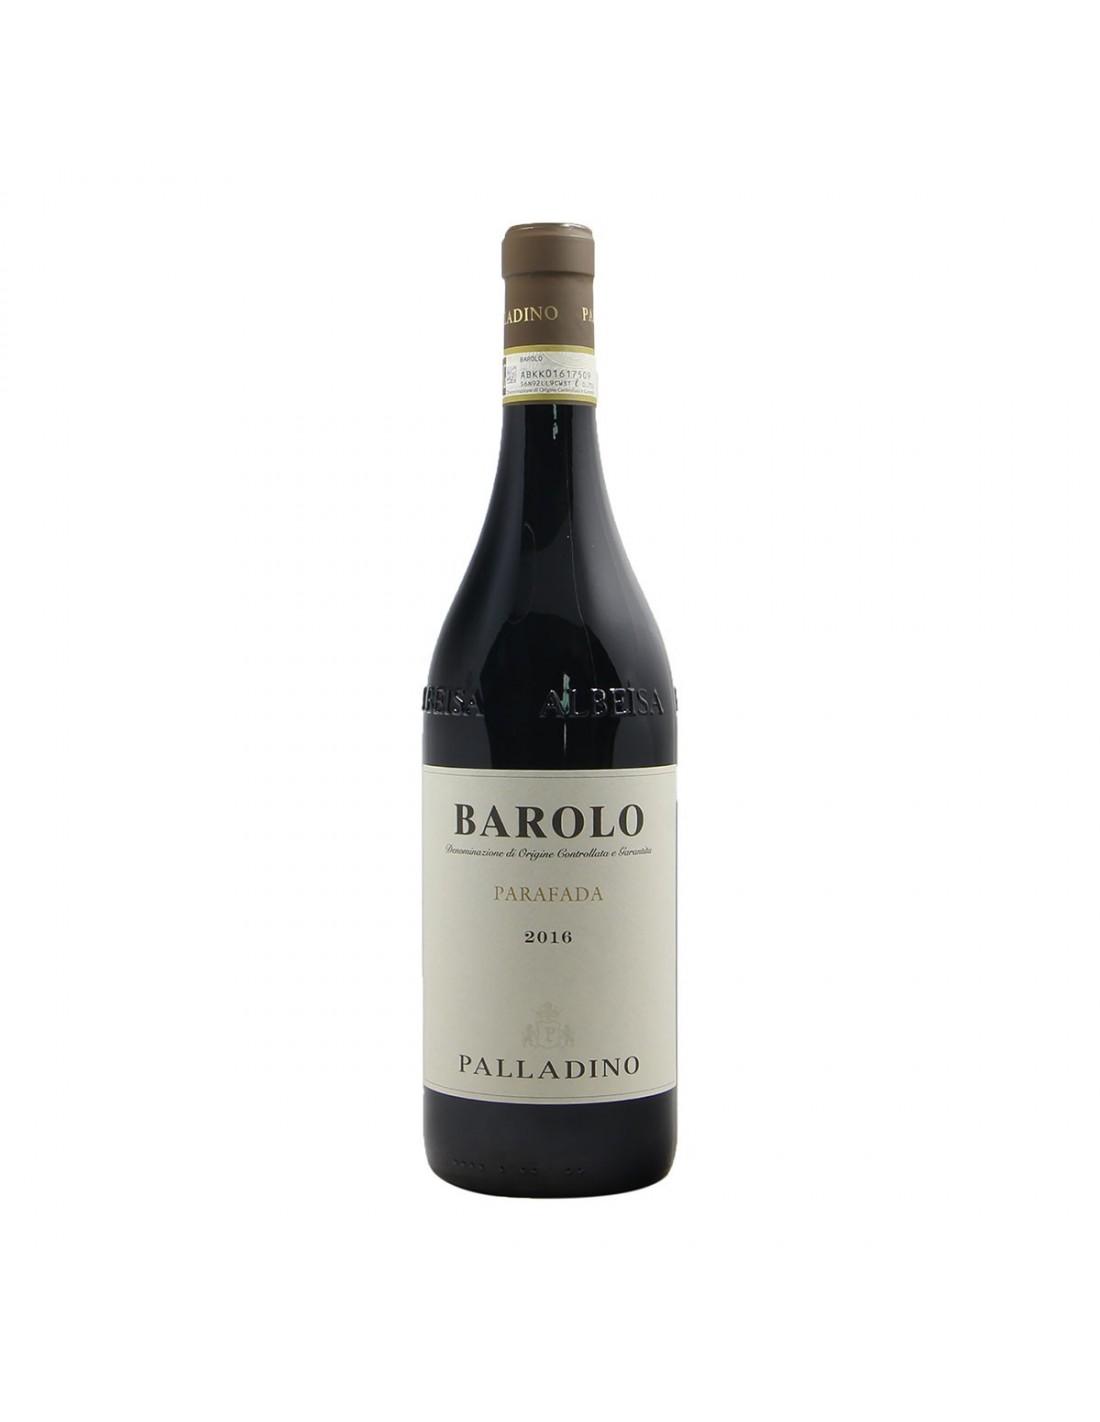 BAROLO PARAFADA 2016 PALLADINO Grandi Bottiglie